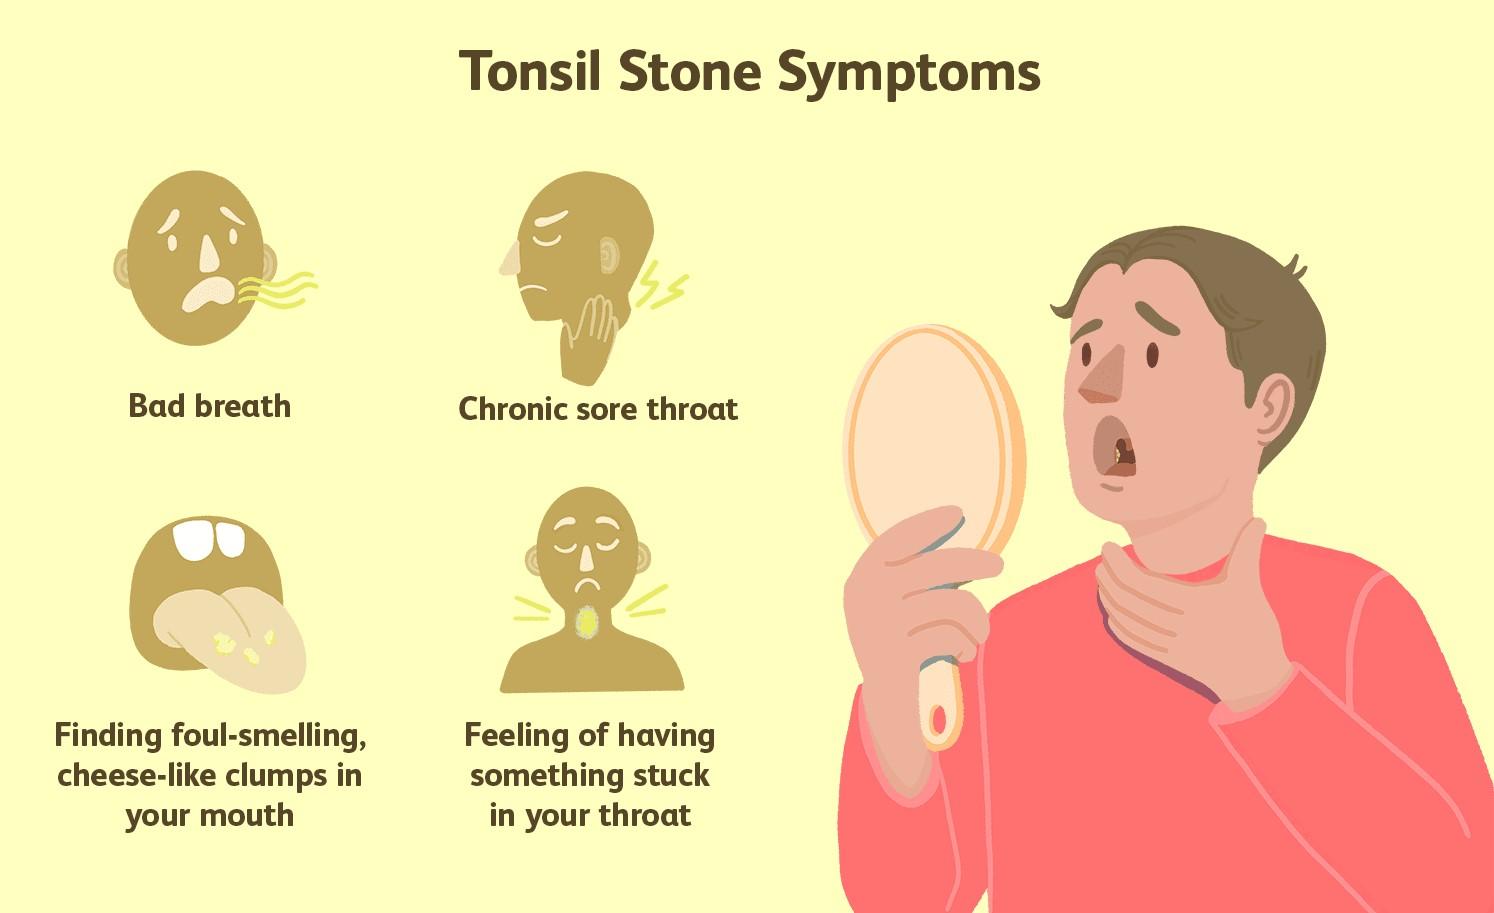 Tonsil Stone Symptoms